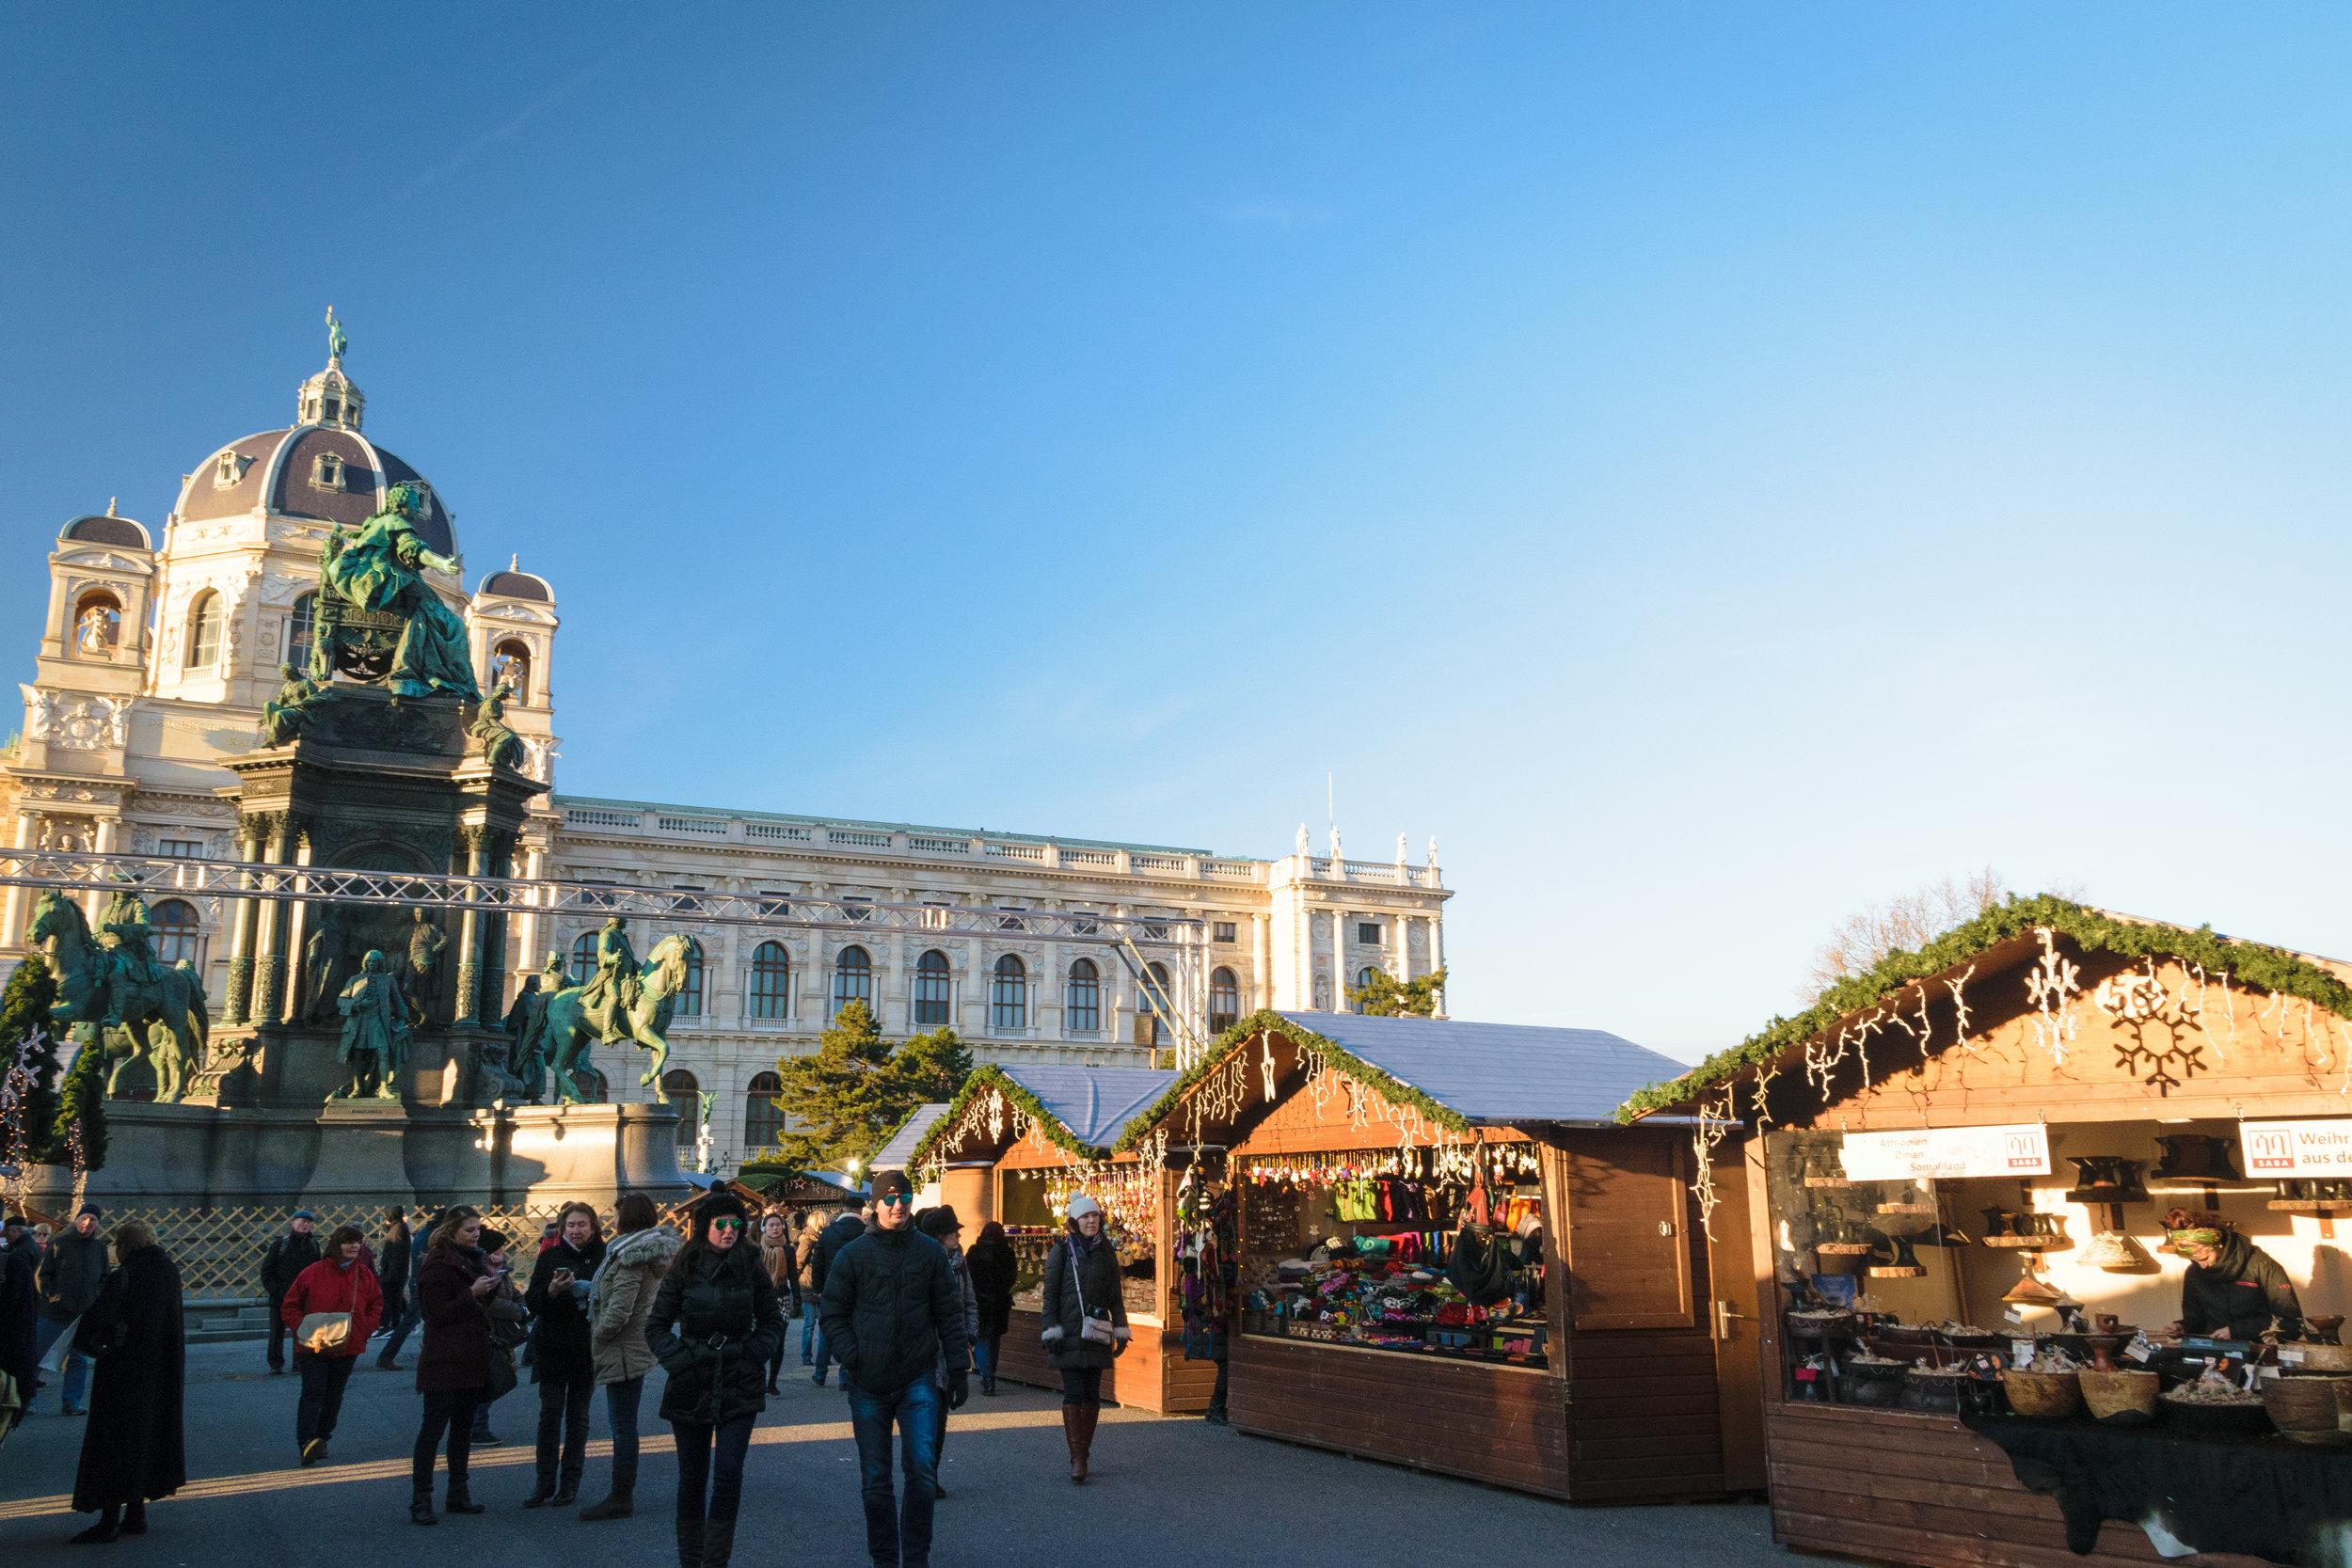 at Maria Theresien Platz